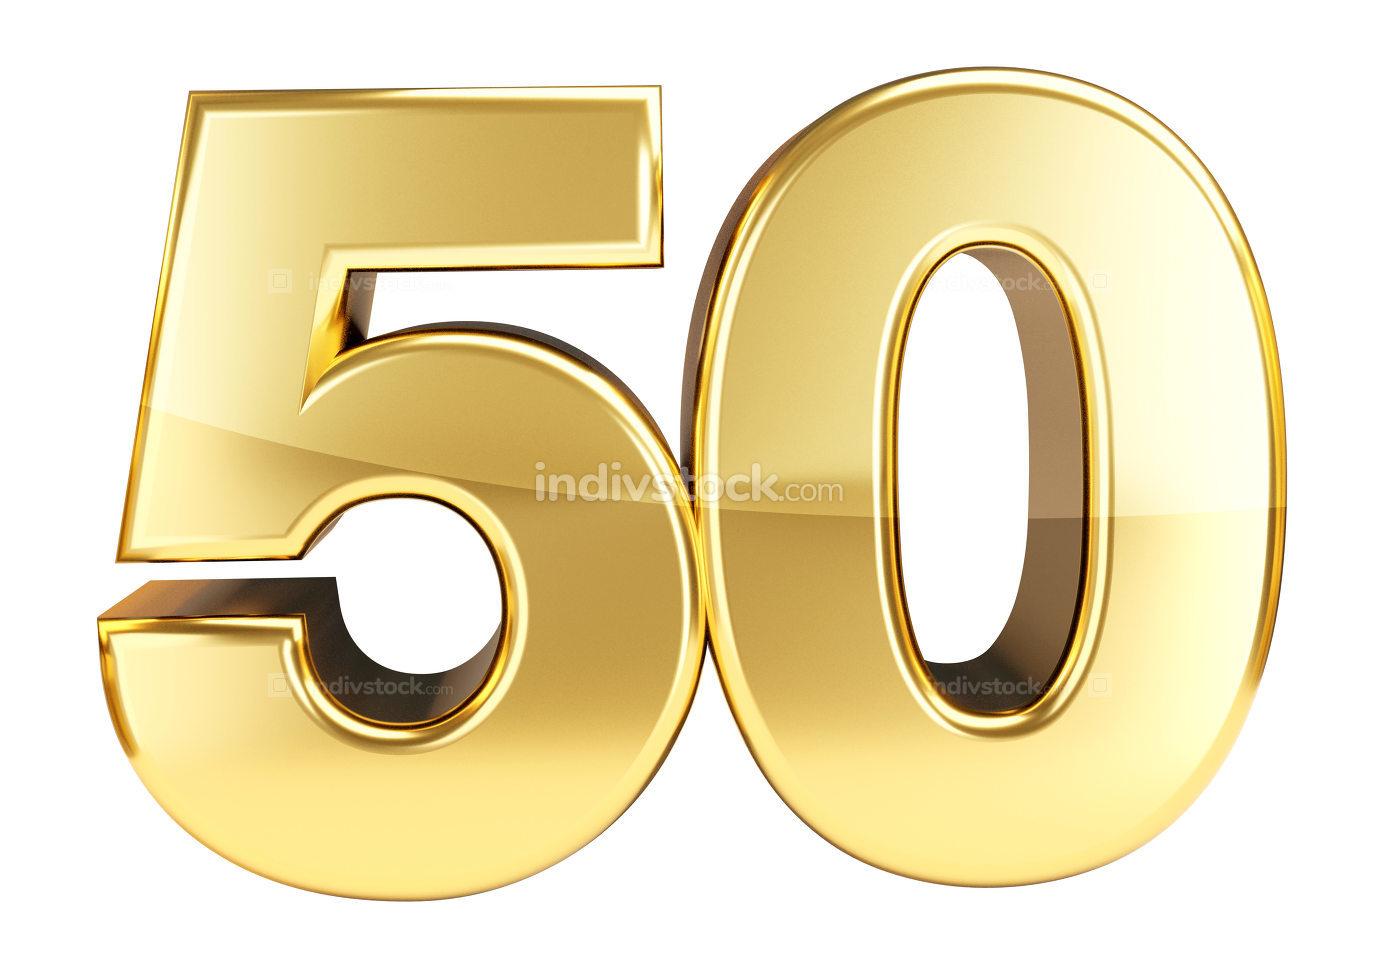 golden 50 3d-illustration